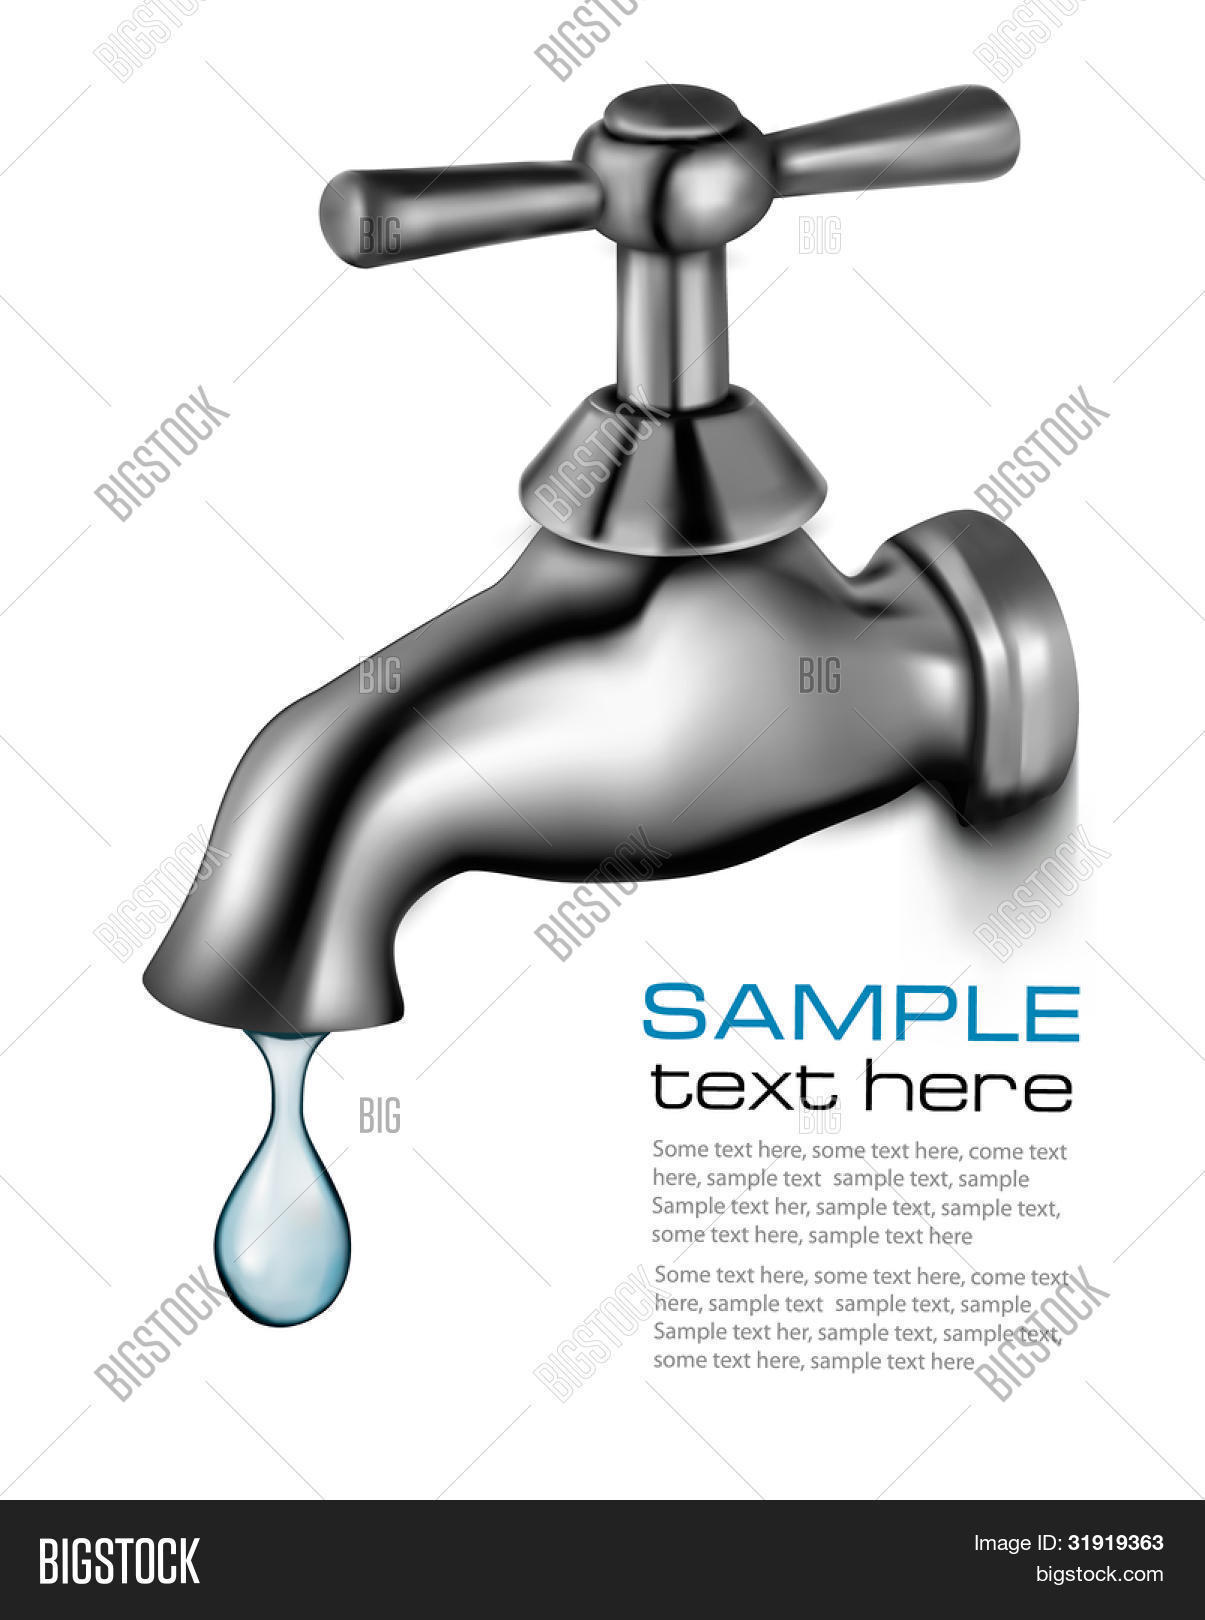 Water Tap Drop. Vector & Photo (Free Trial) | Bigstock